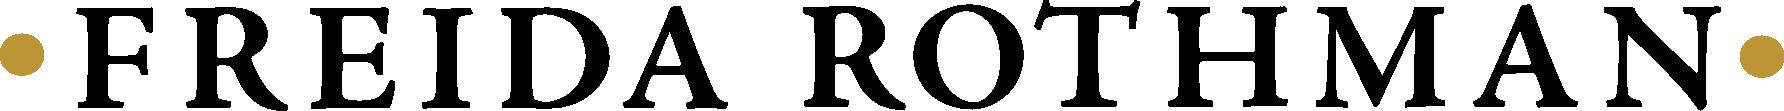 Freida_Rothman_banner_logo